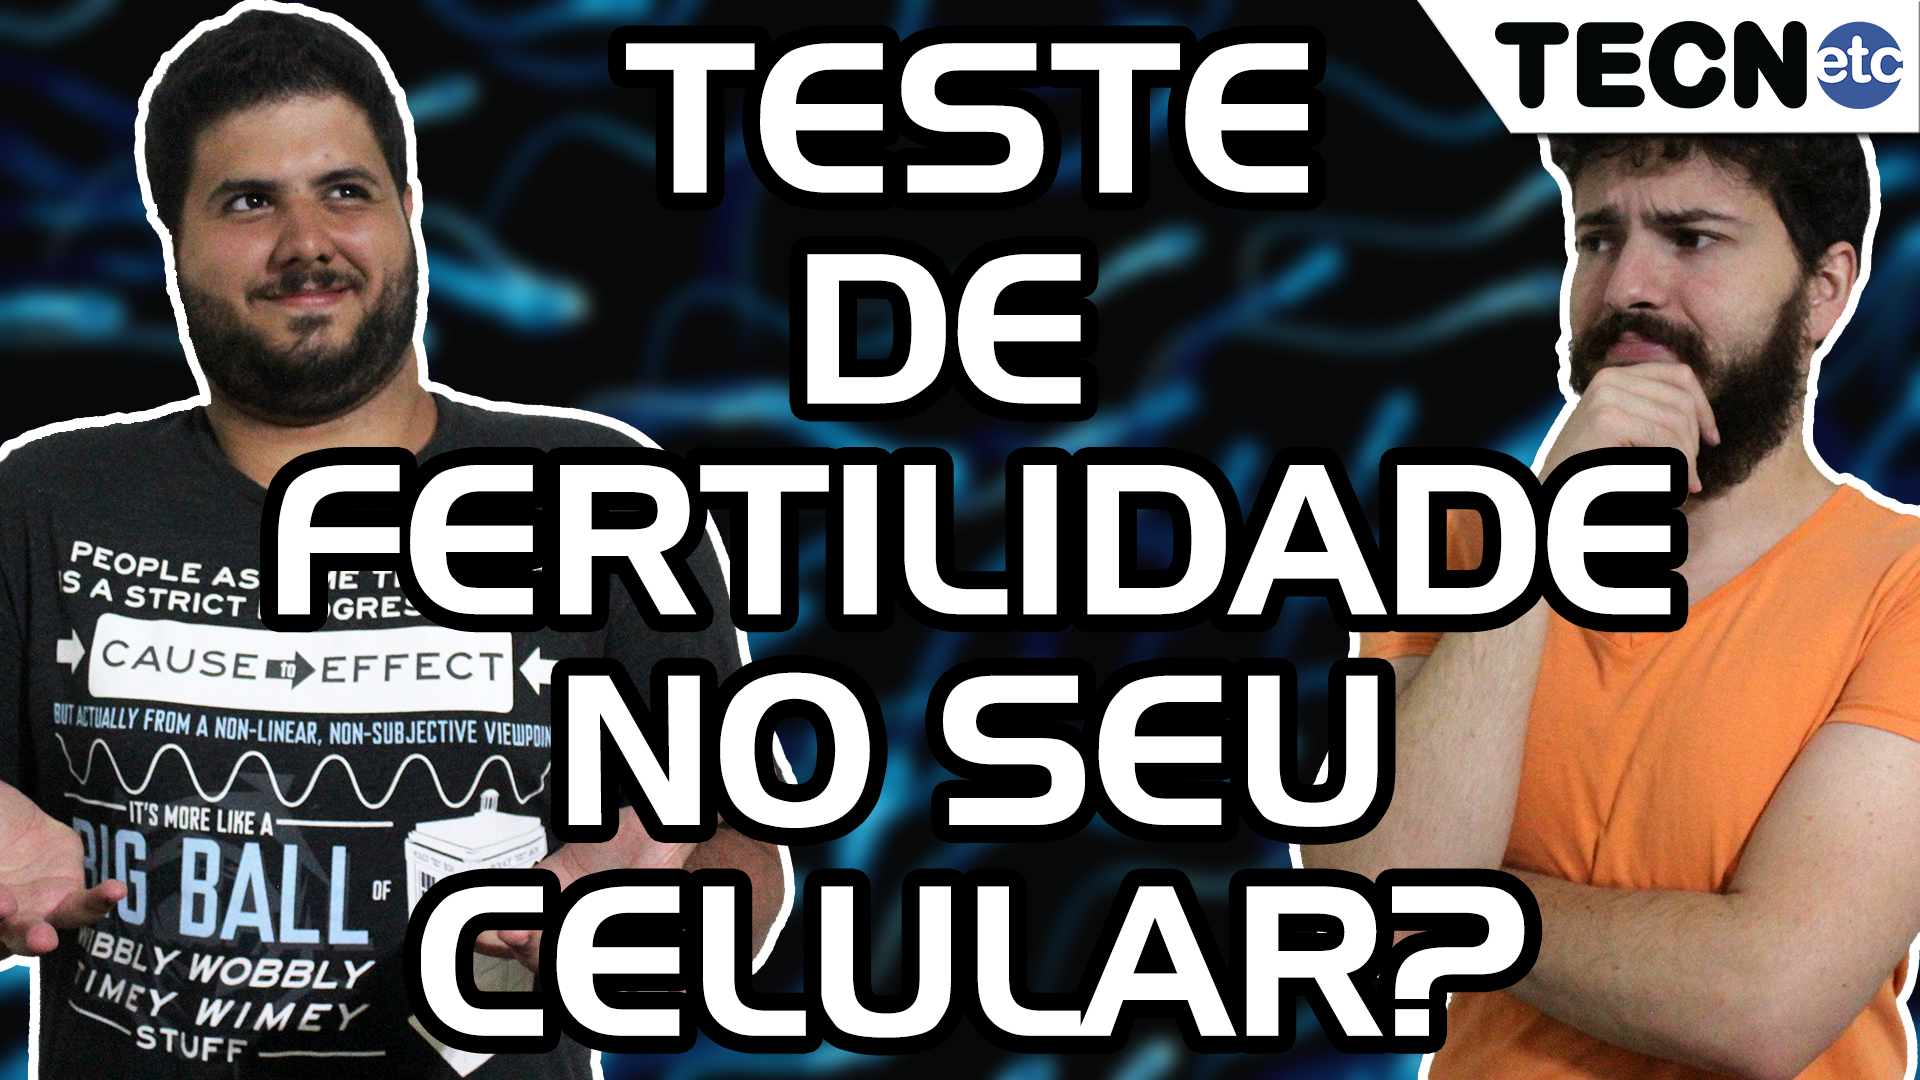 Teste de fertilidade no seu celular? – TECNOetc Drops